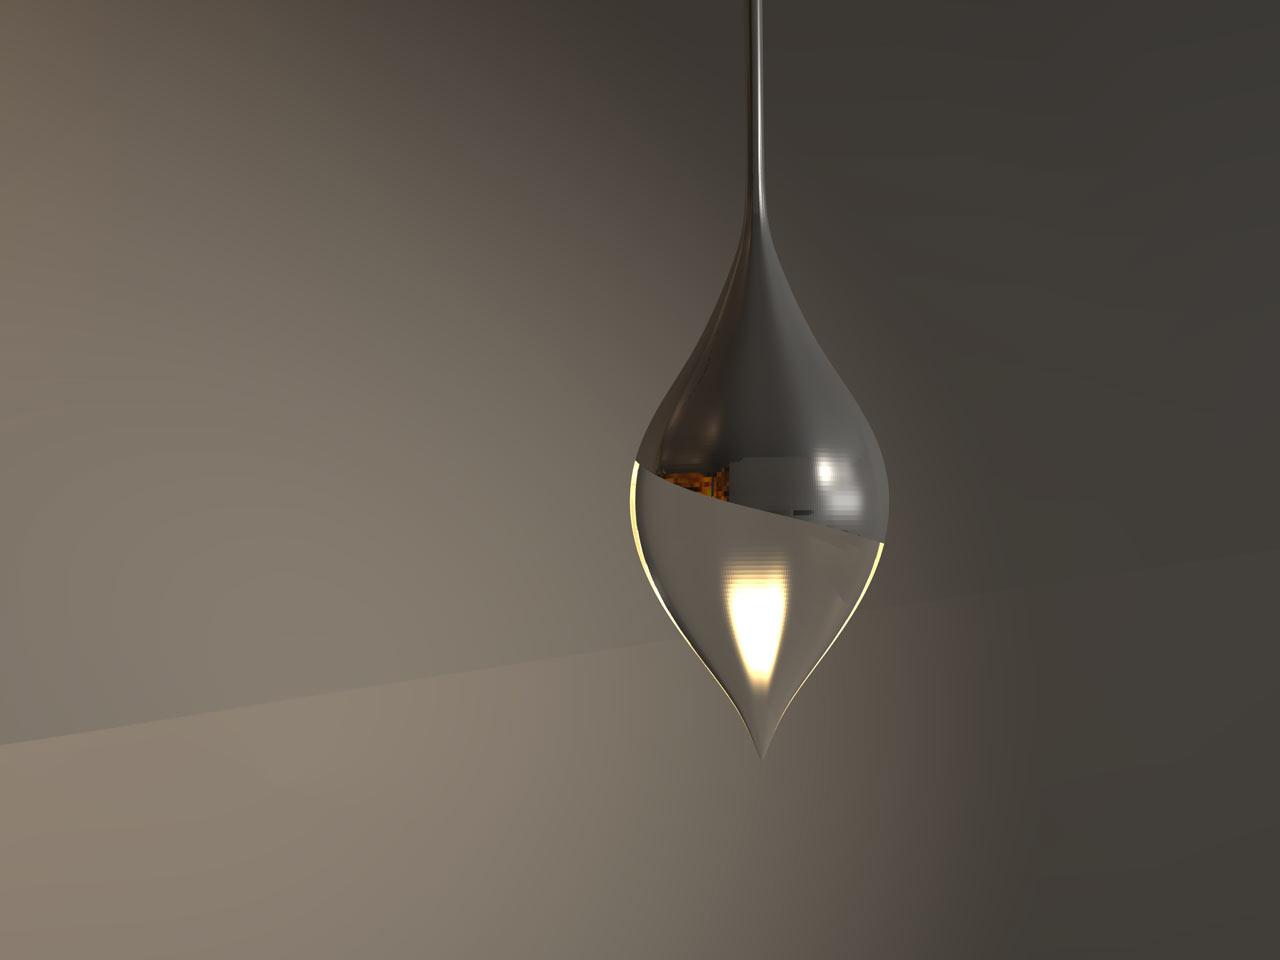 Joeri-Claeys-Stalasso-Light-2